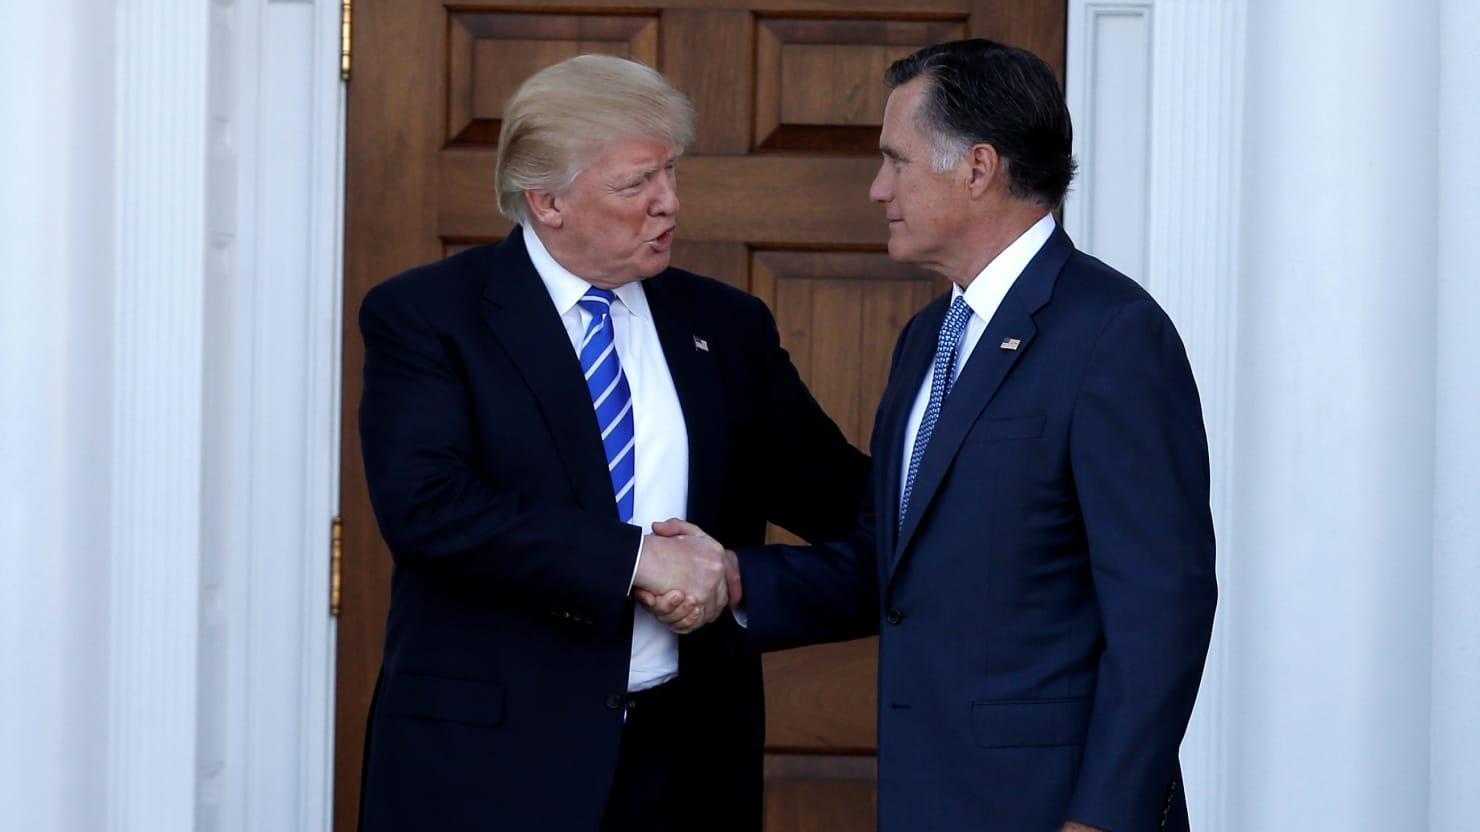 Mitt Romney: War with Iran 'Just Not Going to Happen'